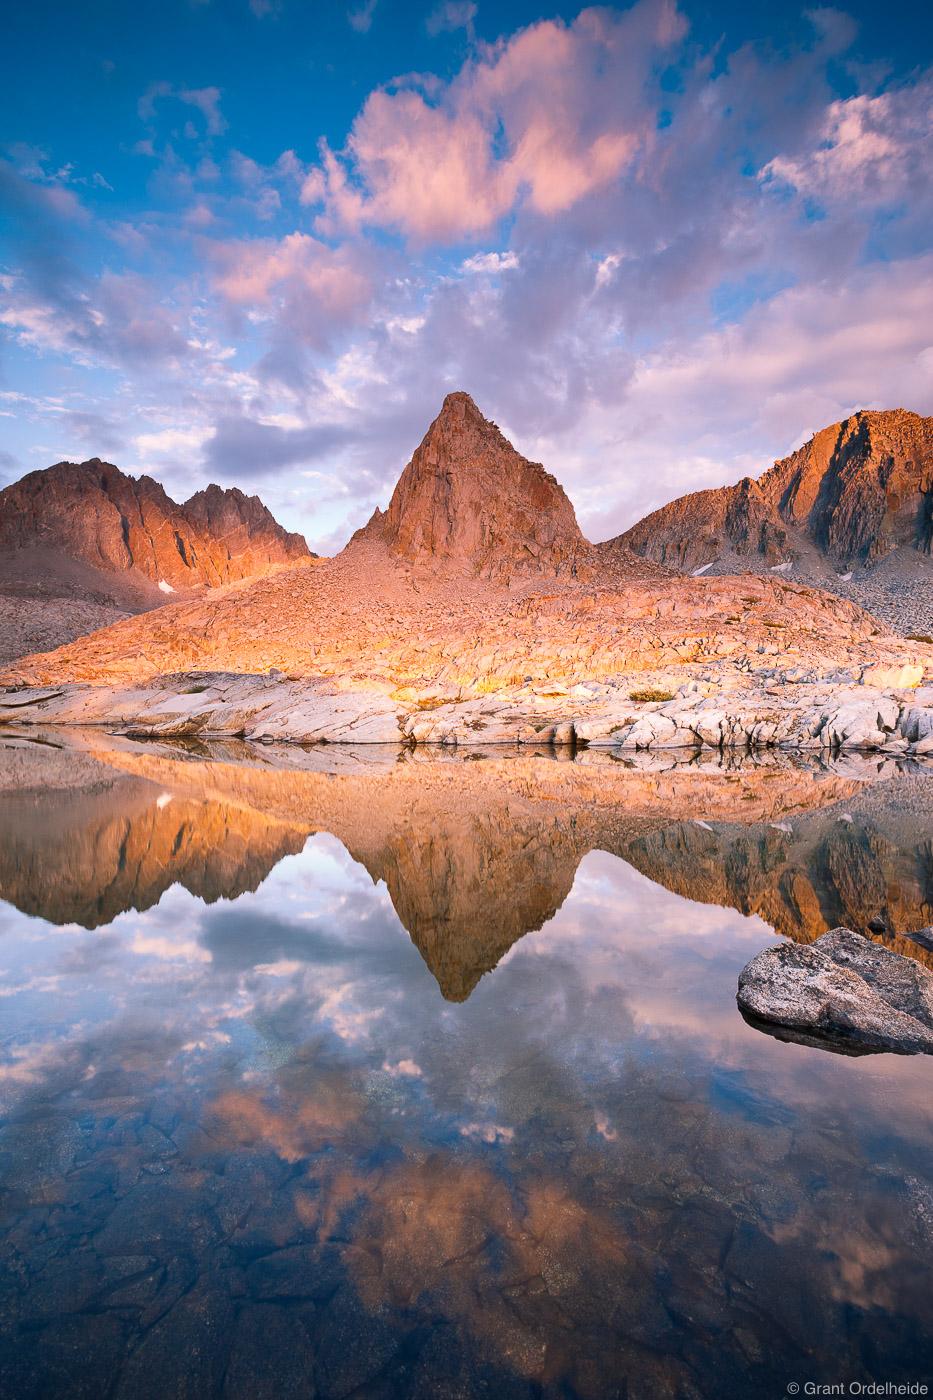 dusy, basin, reflection, isosceles, peak, palisades, alpine, tarn, high, eastern sierra, california, kings canyon, natio, photo